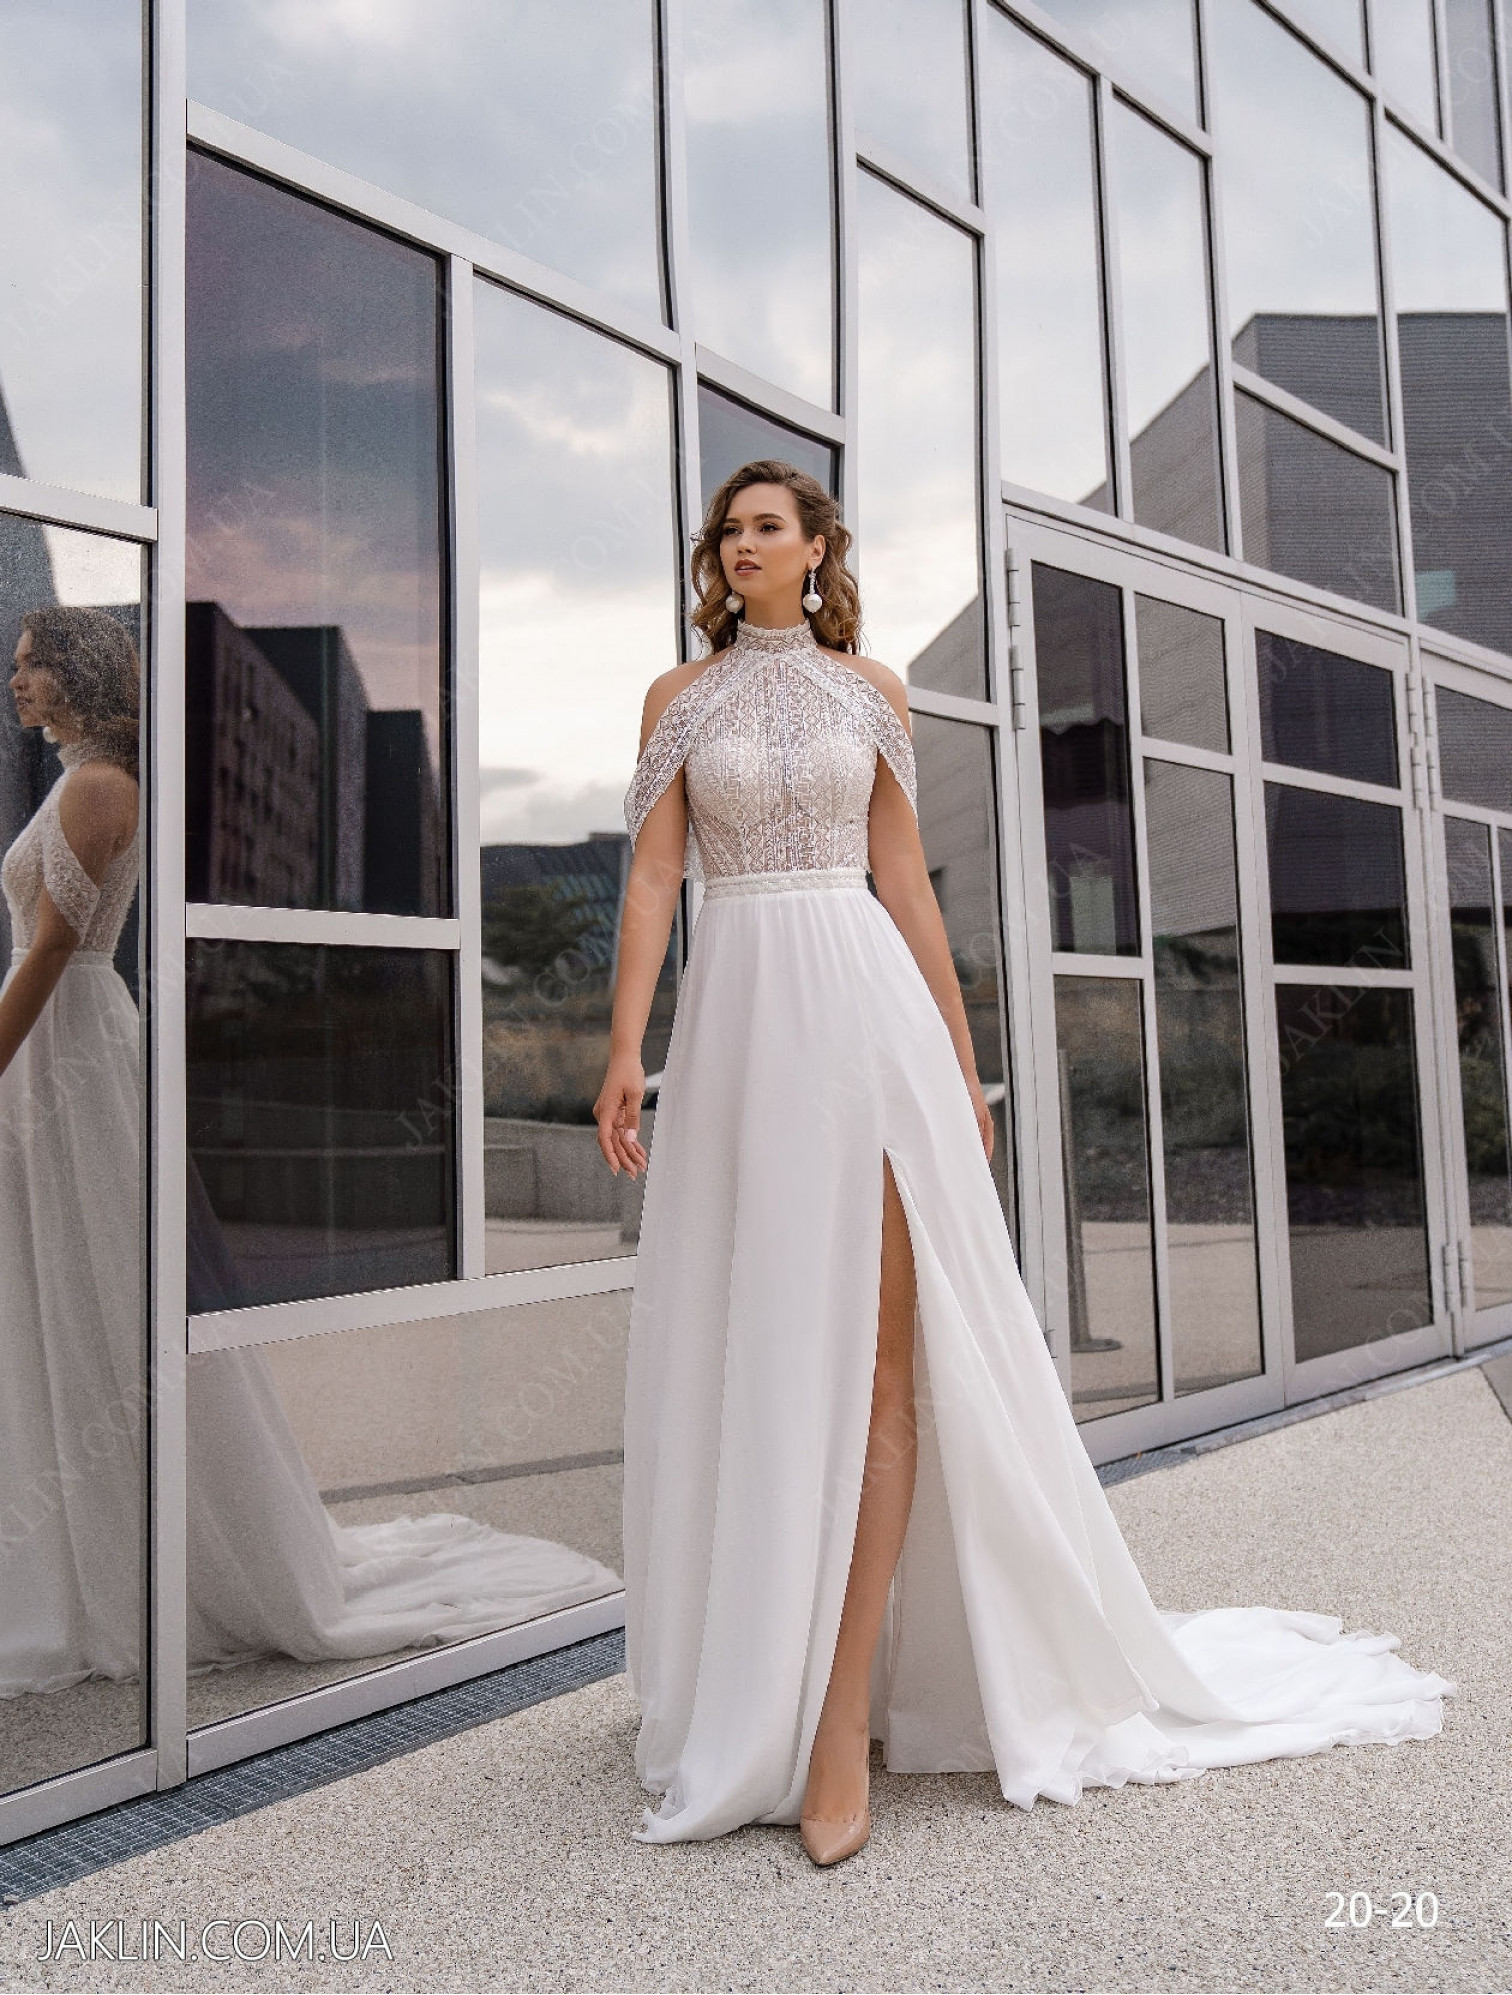 Wedding dress 20-20